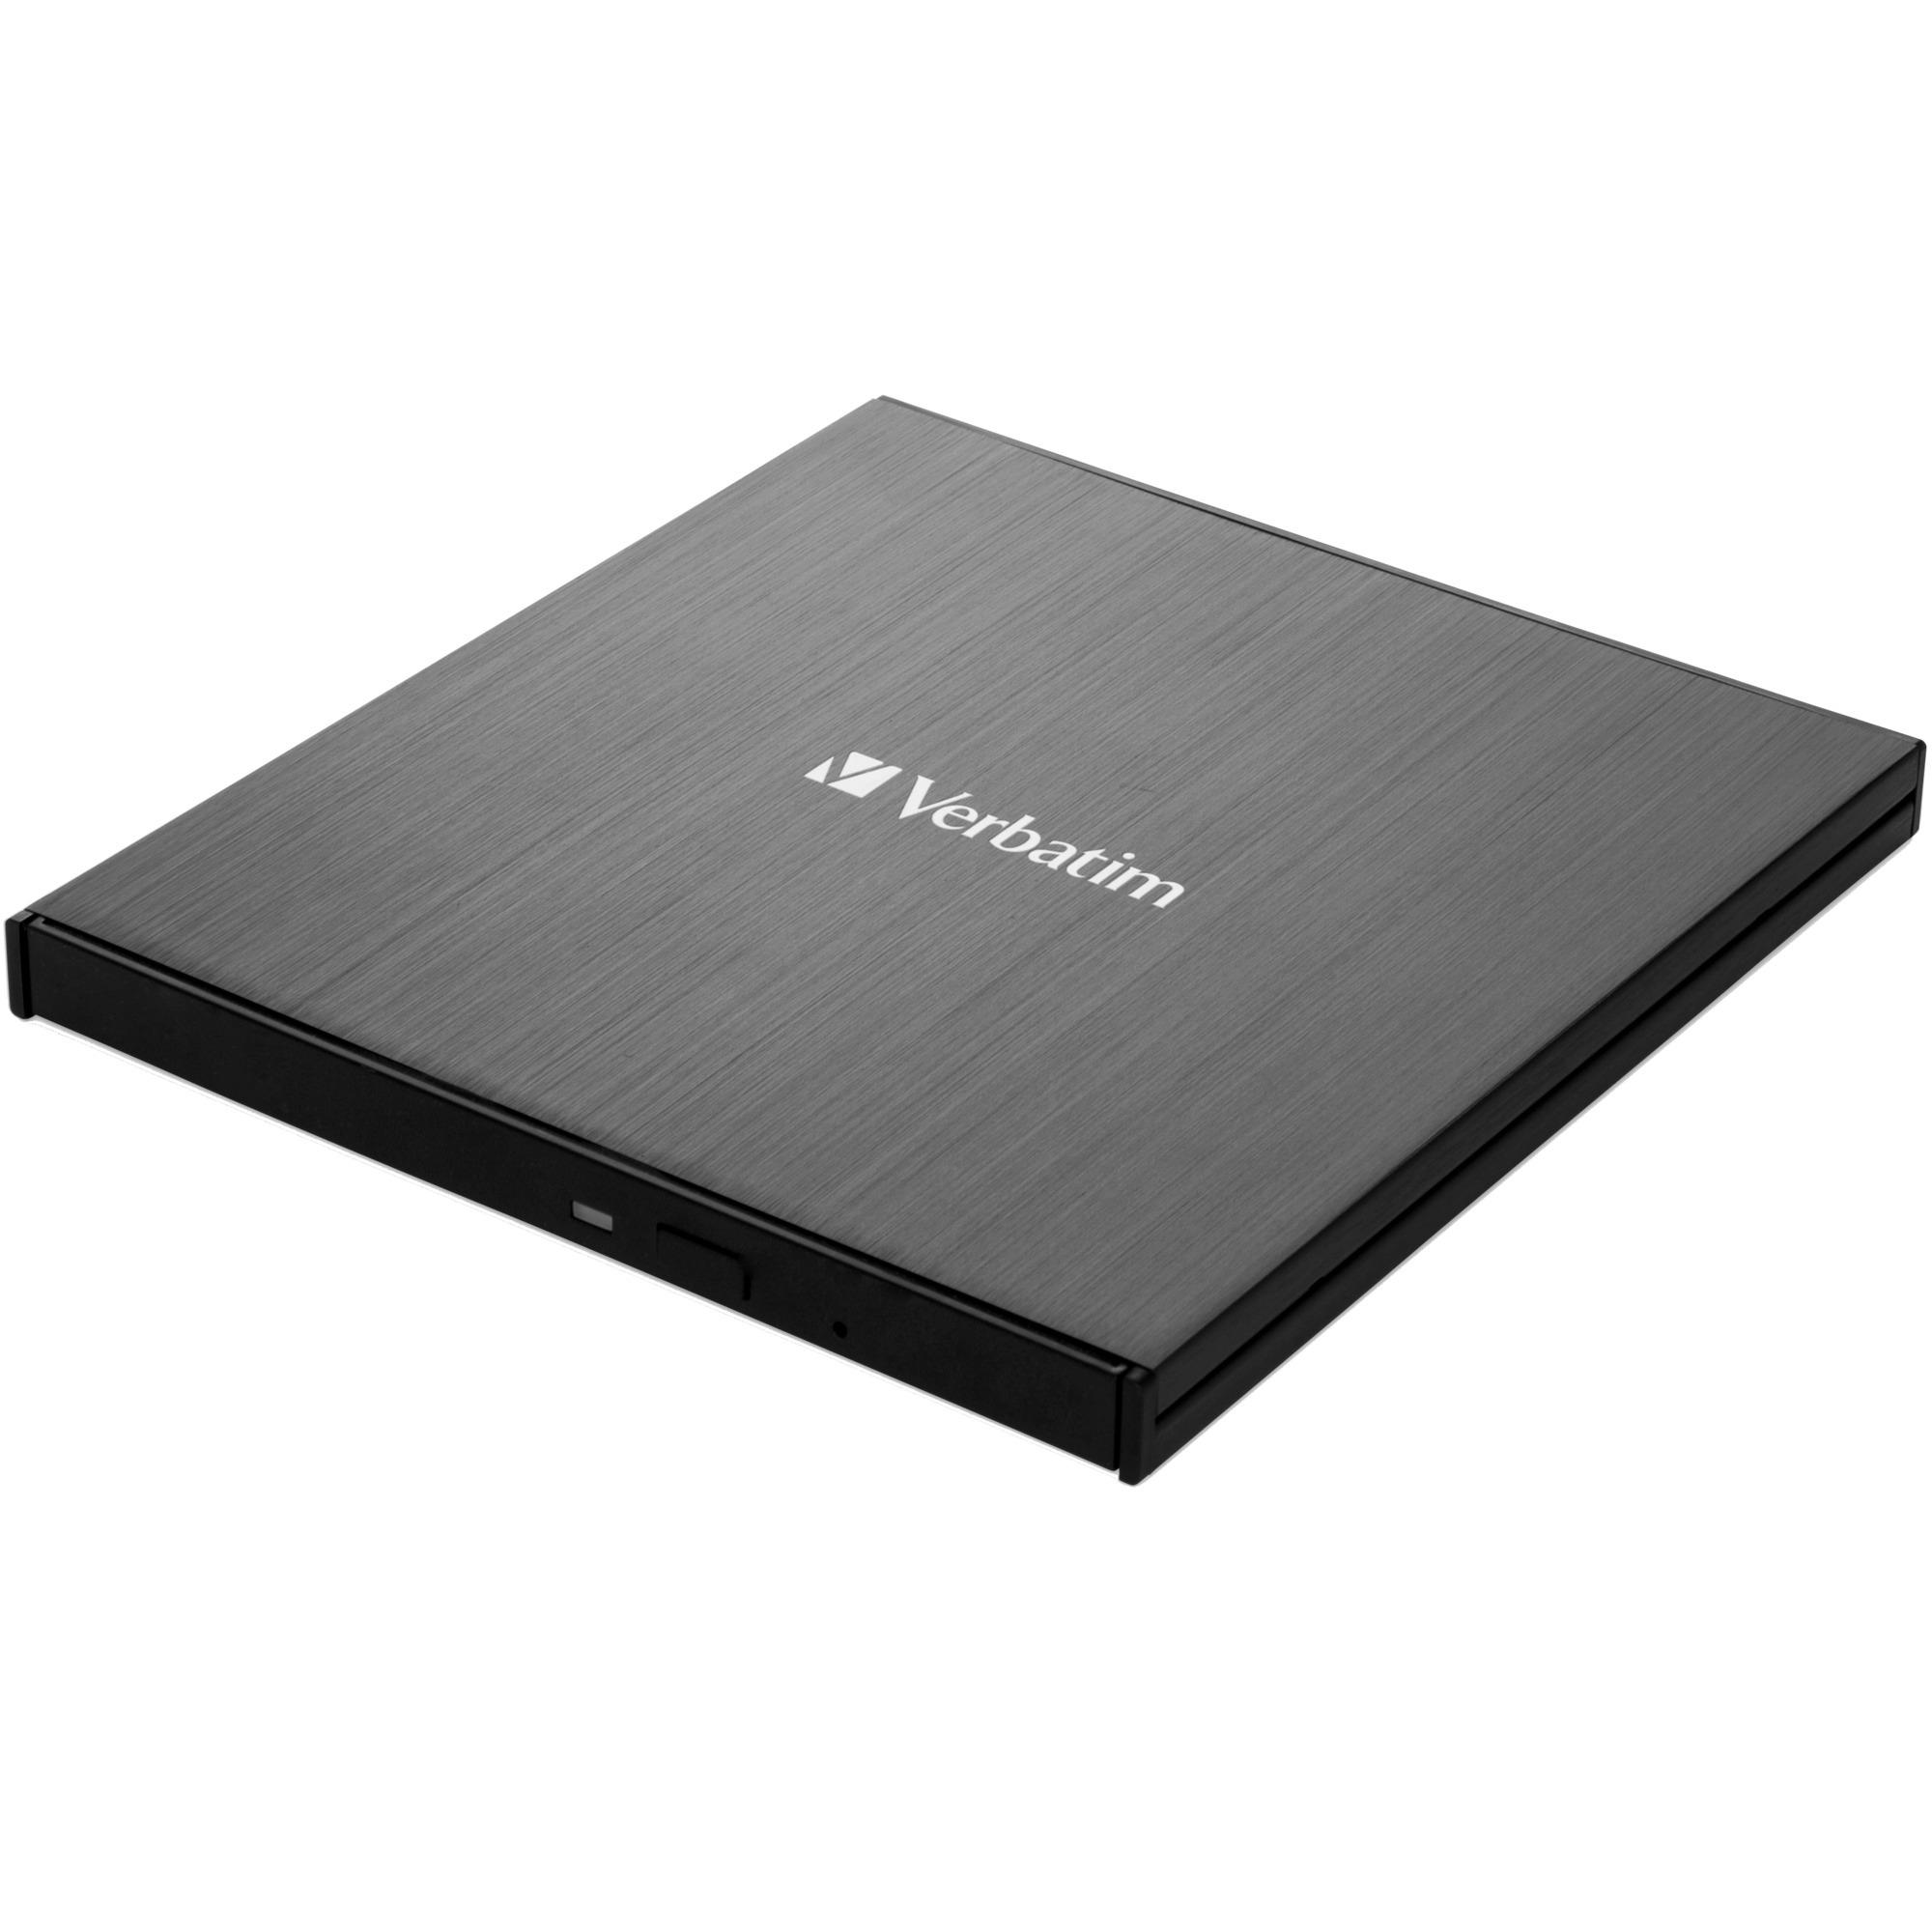 43889, Regrabadora Blu-ray